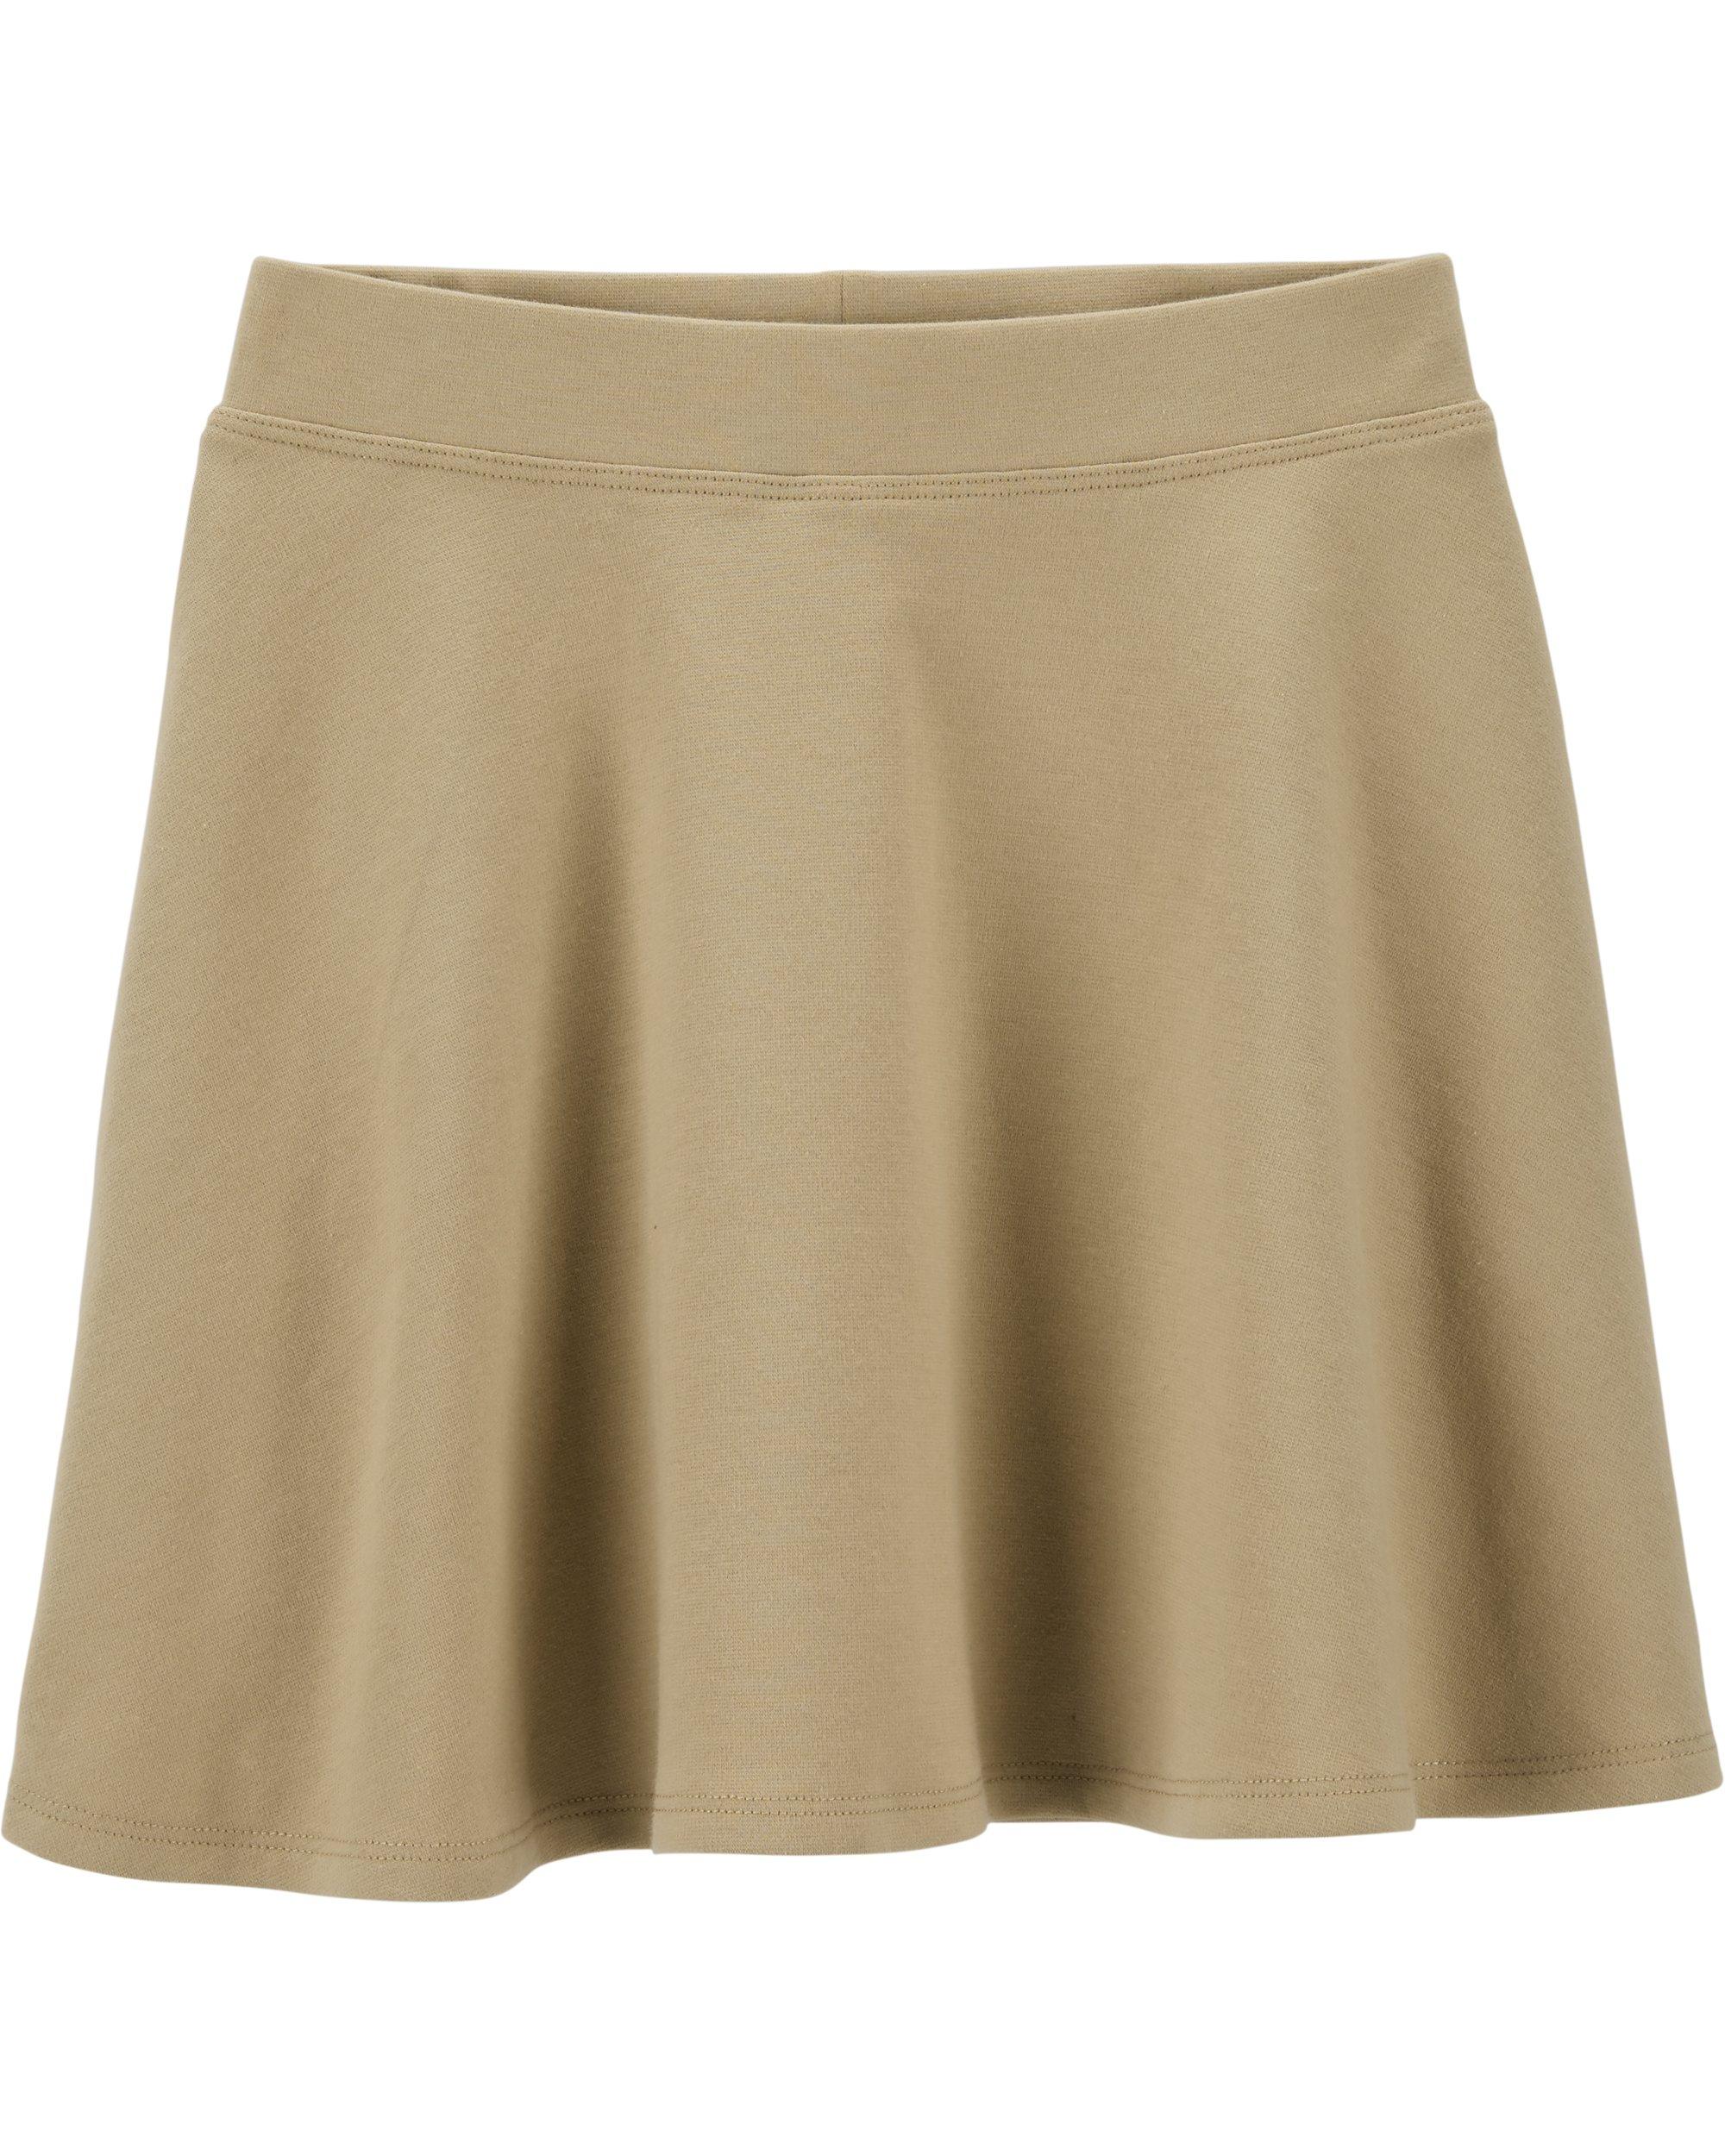 Osh Kosh Girls' Kids Uniform Ponte Skirt, Khaki, 7